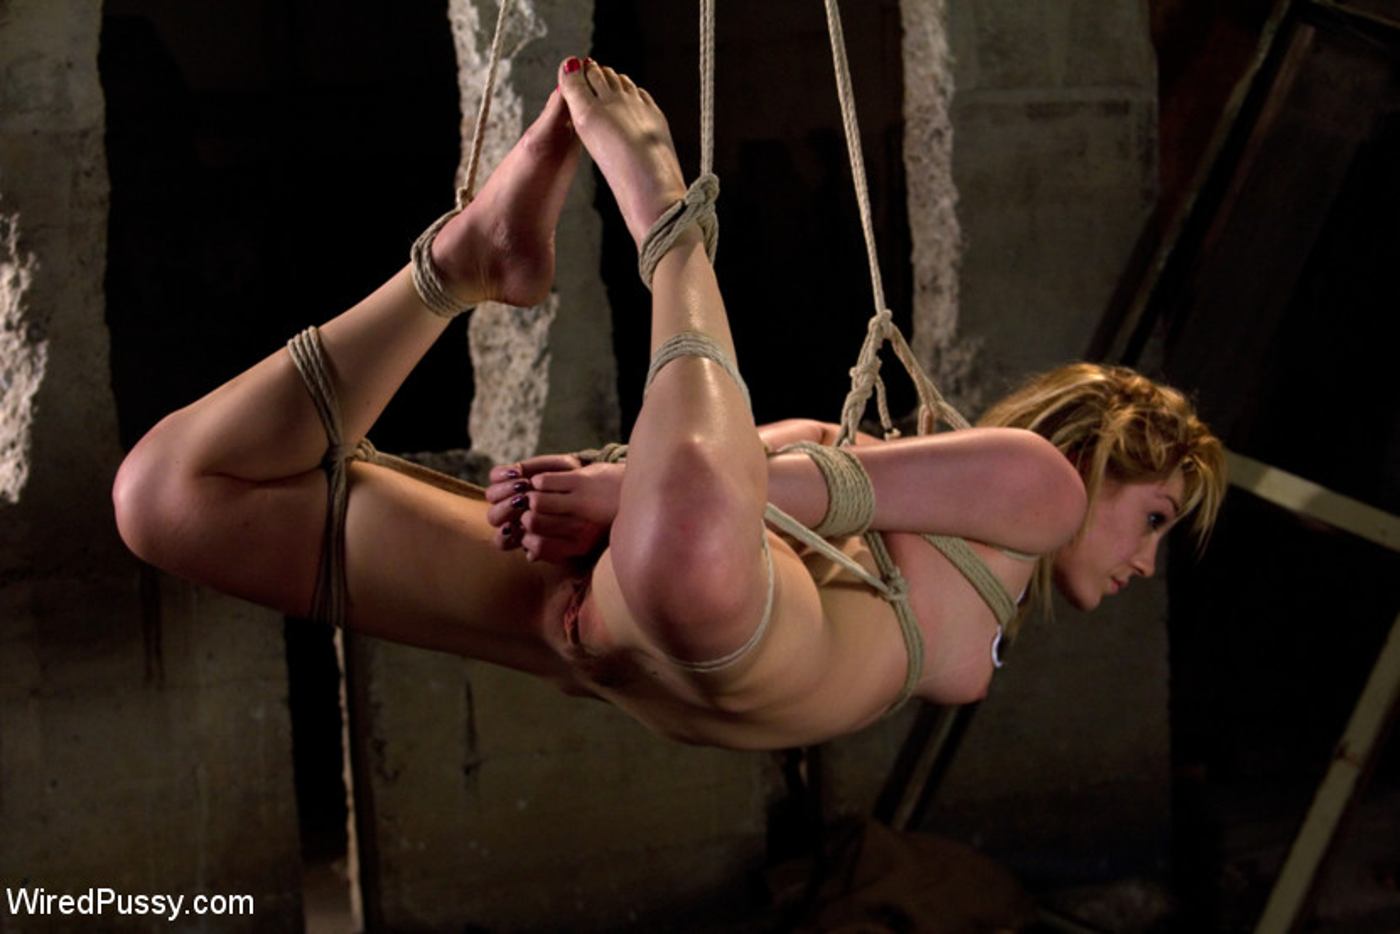 Mistress body domination